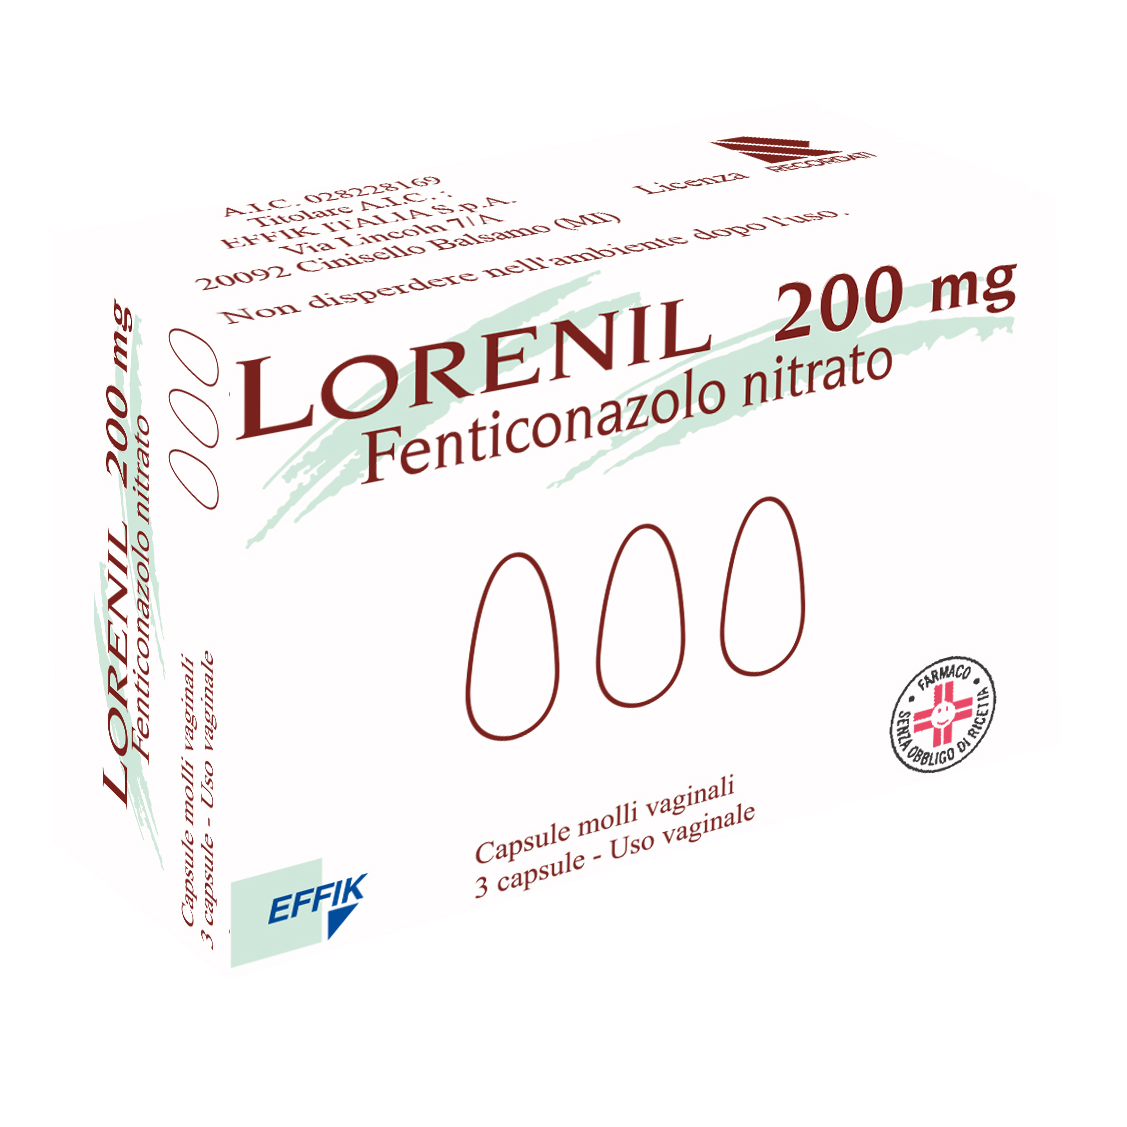 Lorenil*3cps Molli Vag 200mg